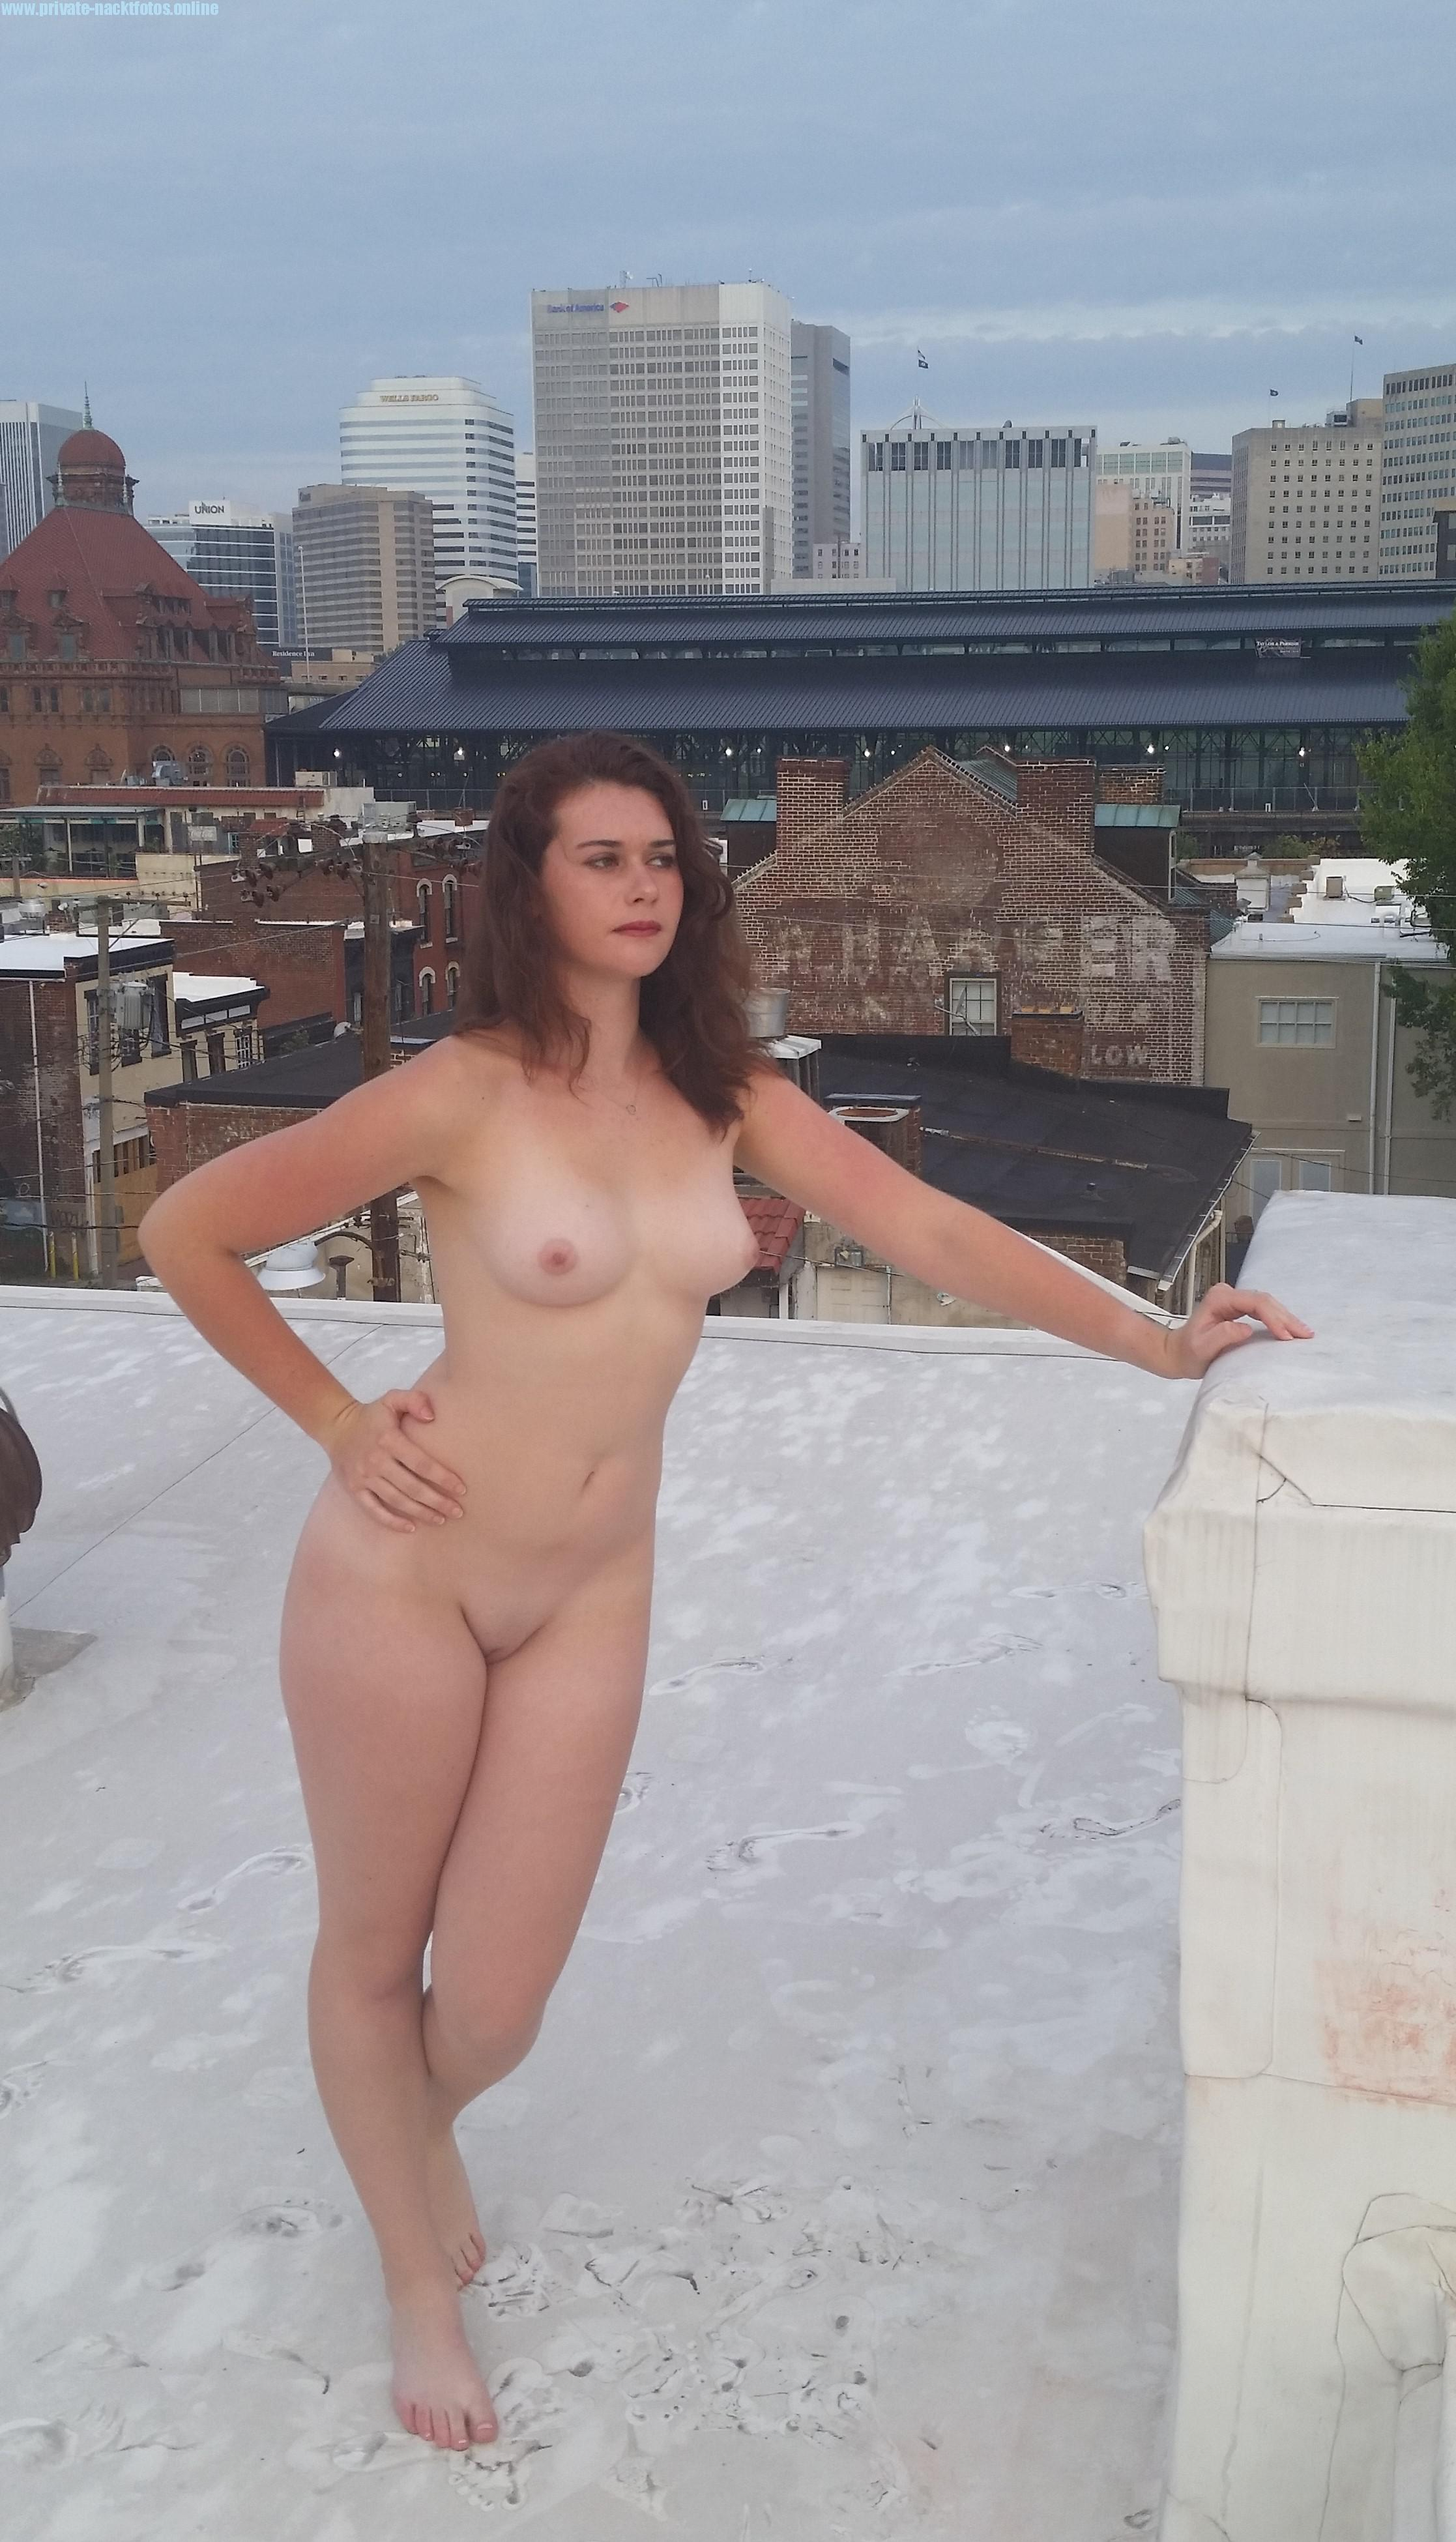 Frau Nackt Im Schnee